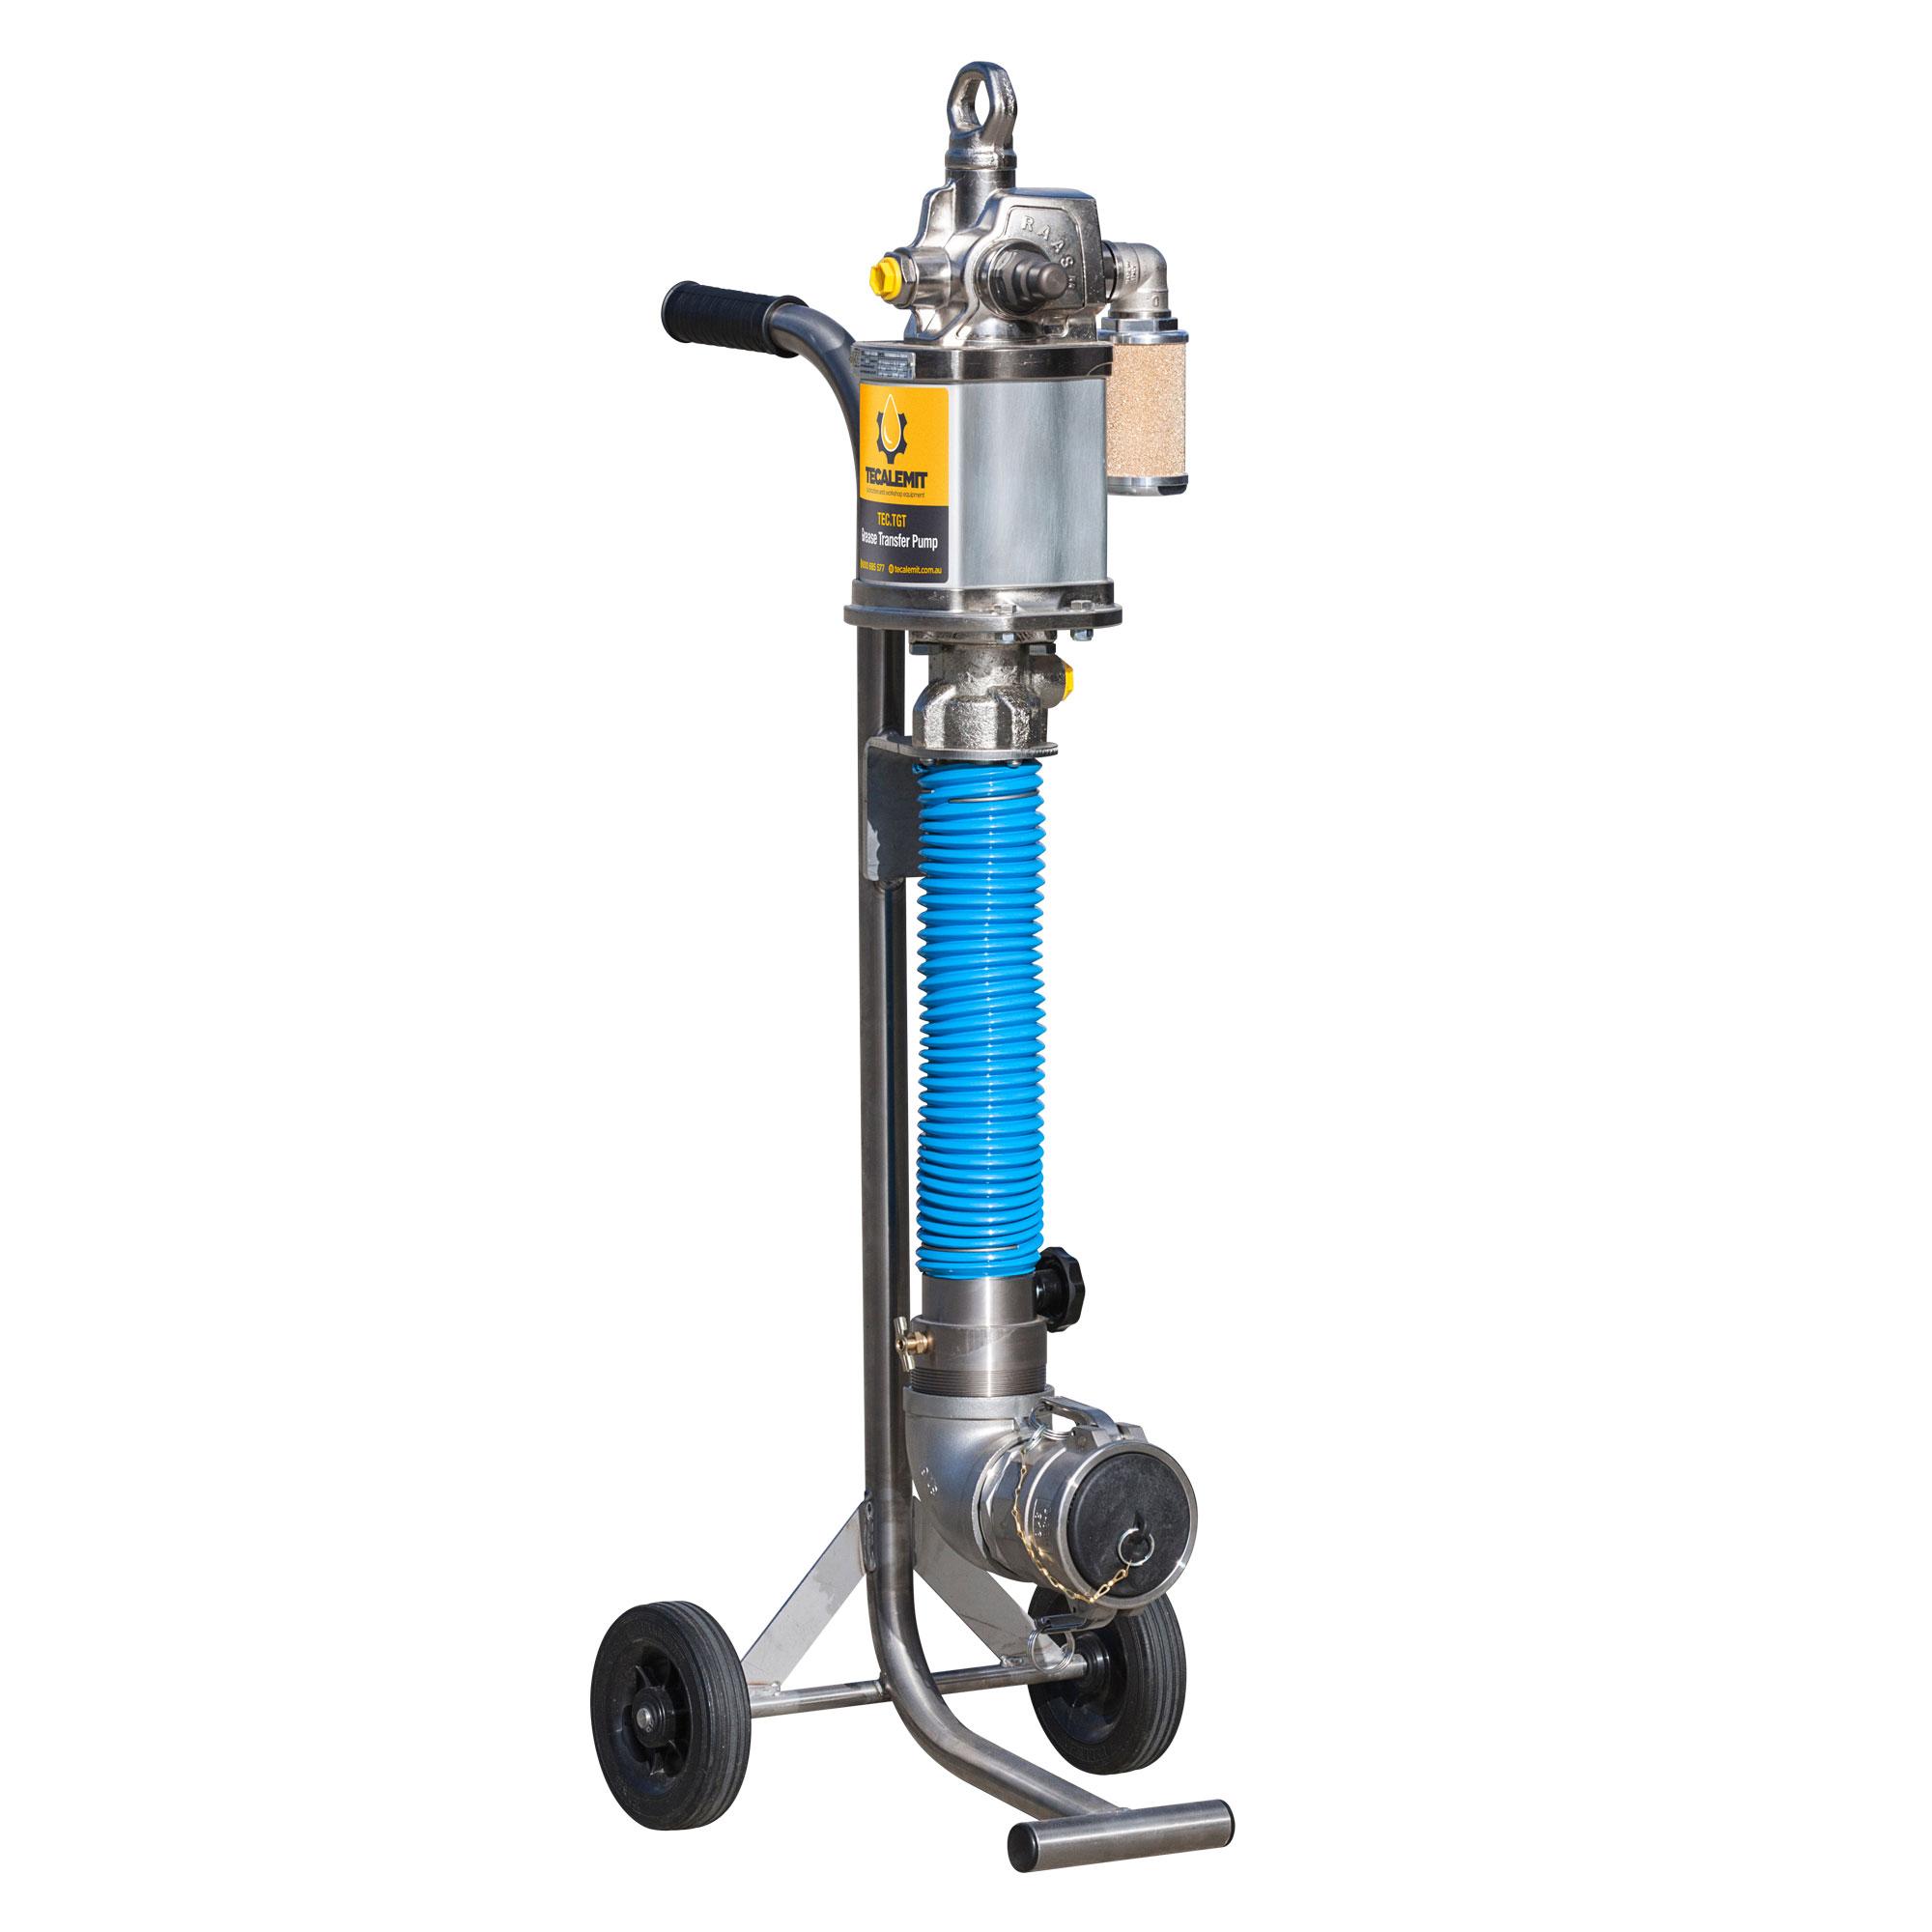 TEC.TGT - Portable, High Flow Grease Transfer Pump